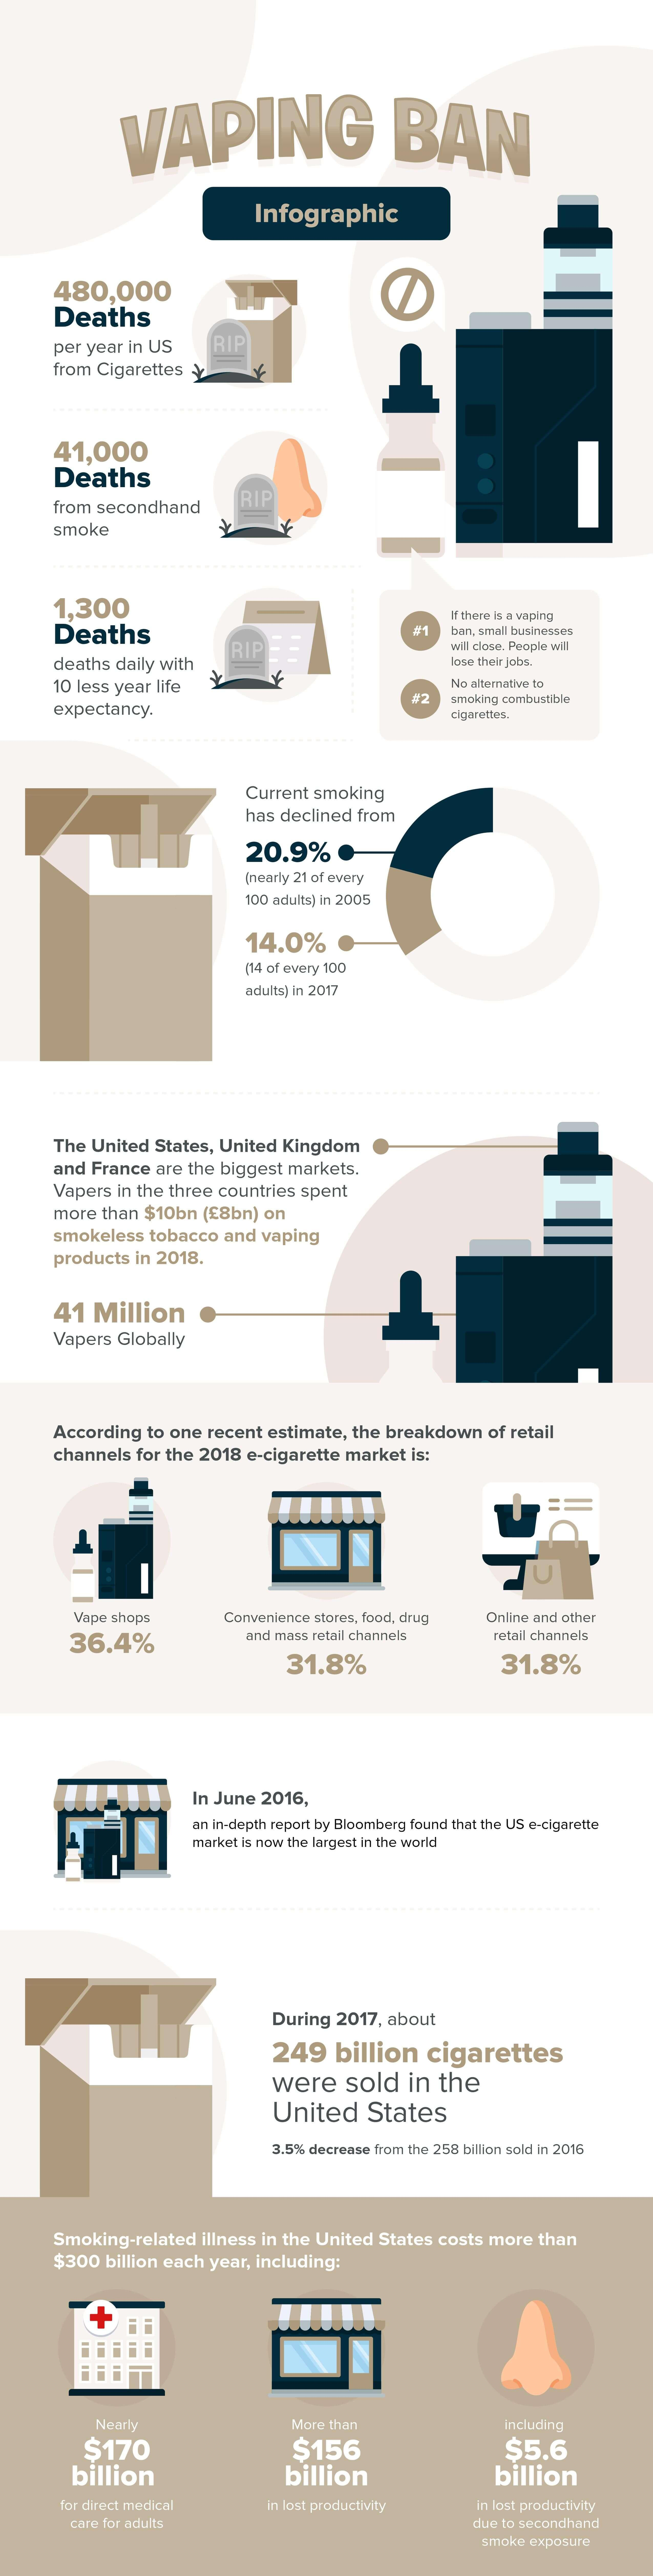 vaping-ban-infographic-plaza